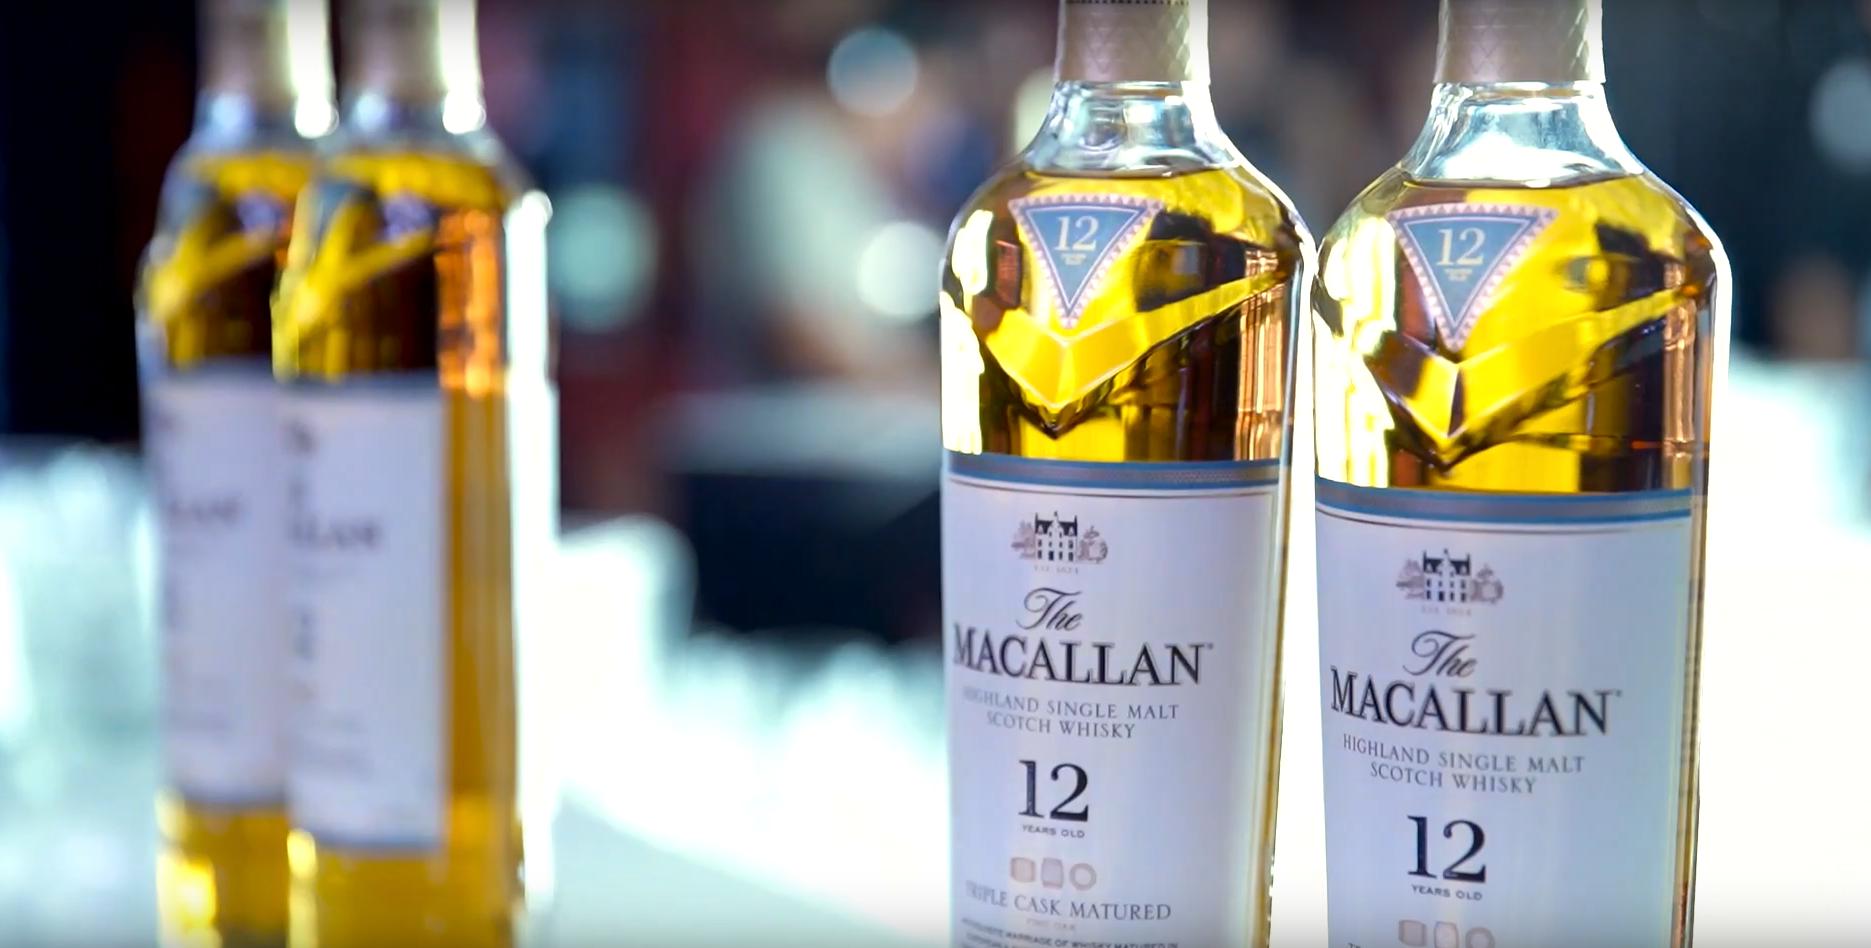 Video: The Macallan At The Hong Kong Tatler Ball 2018